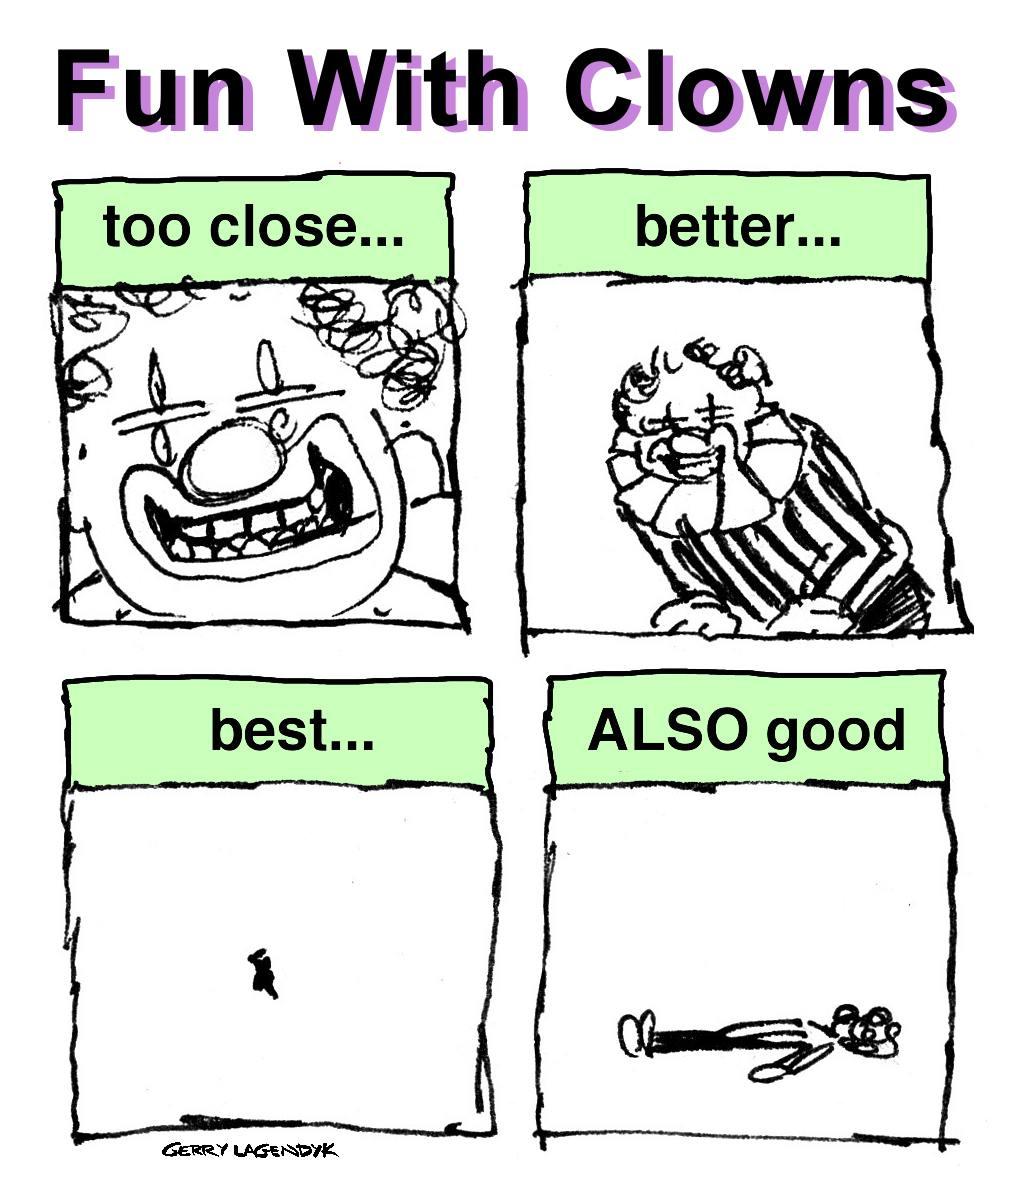 fun with clowns, circus clown cartoon, clowns are not funny